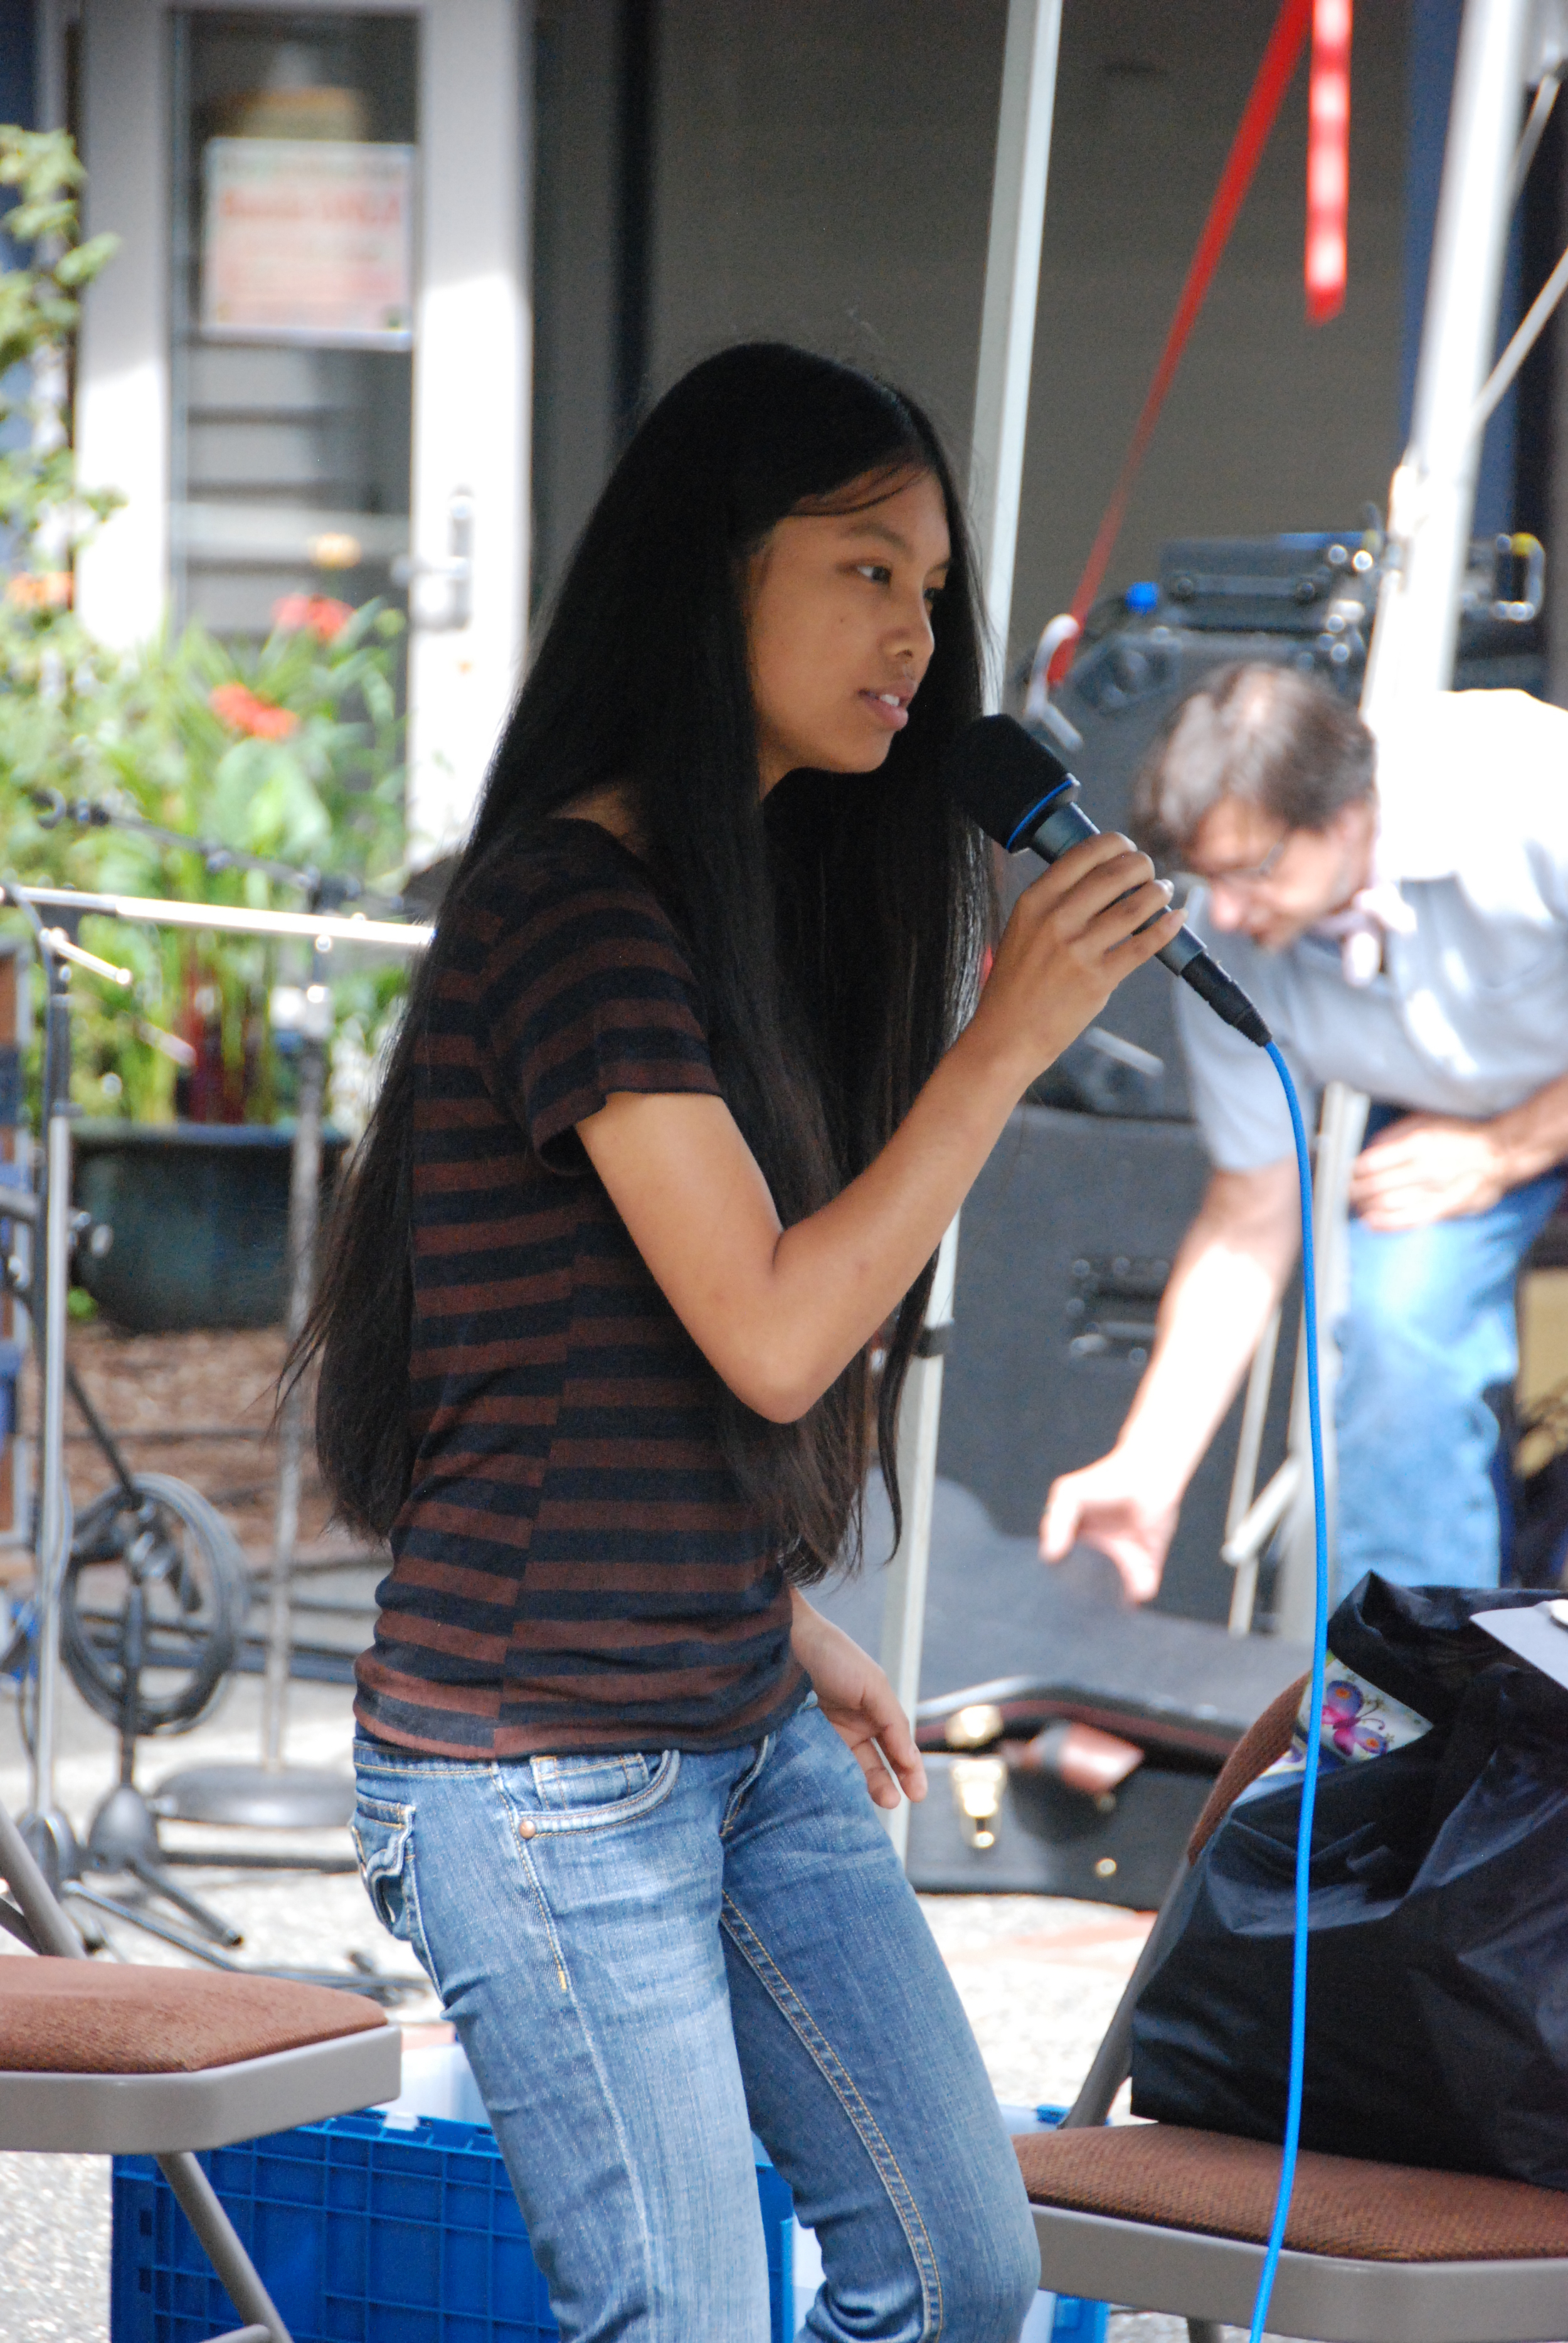 072212 Strawberry Festival Sunday 189.JPG